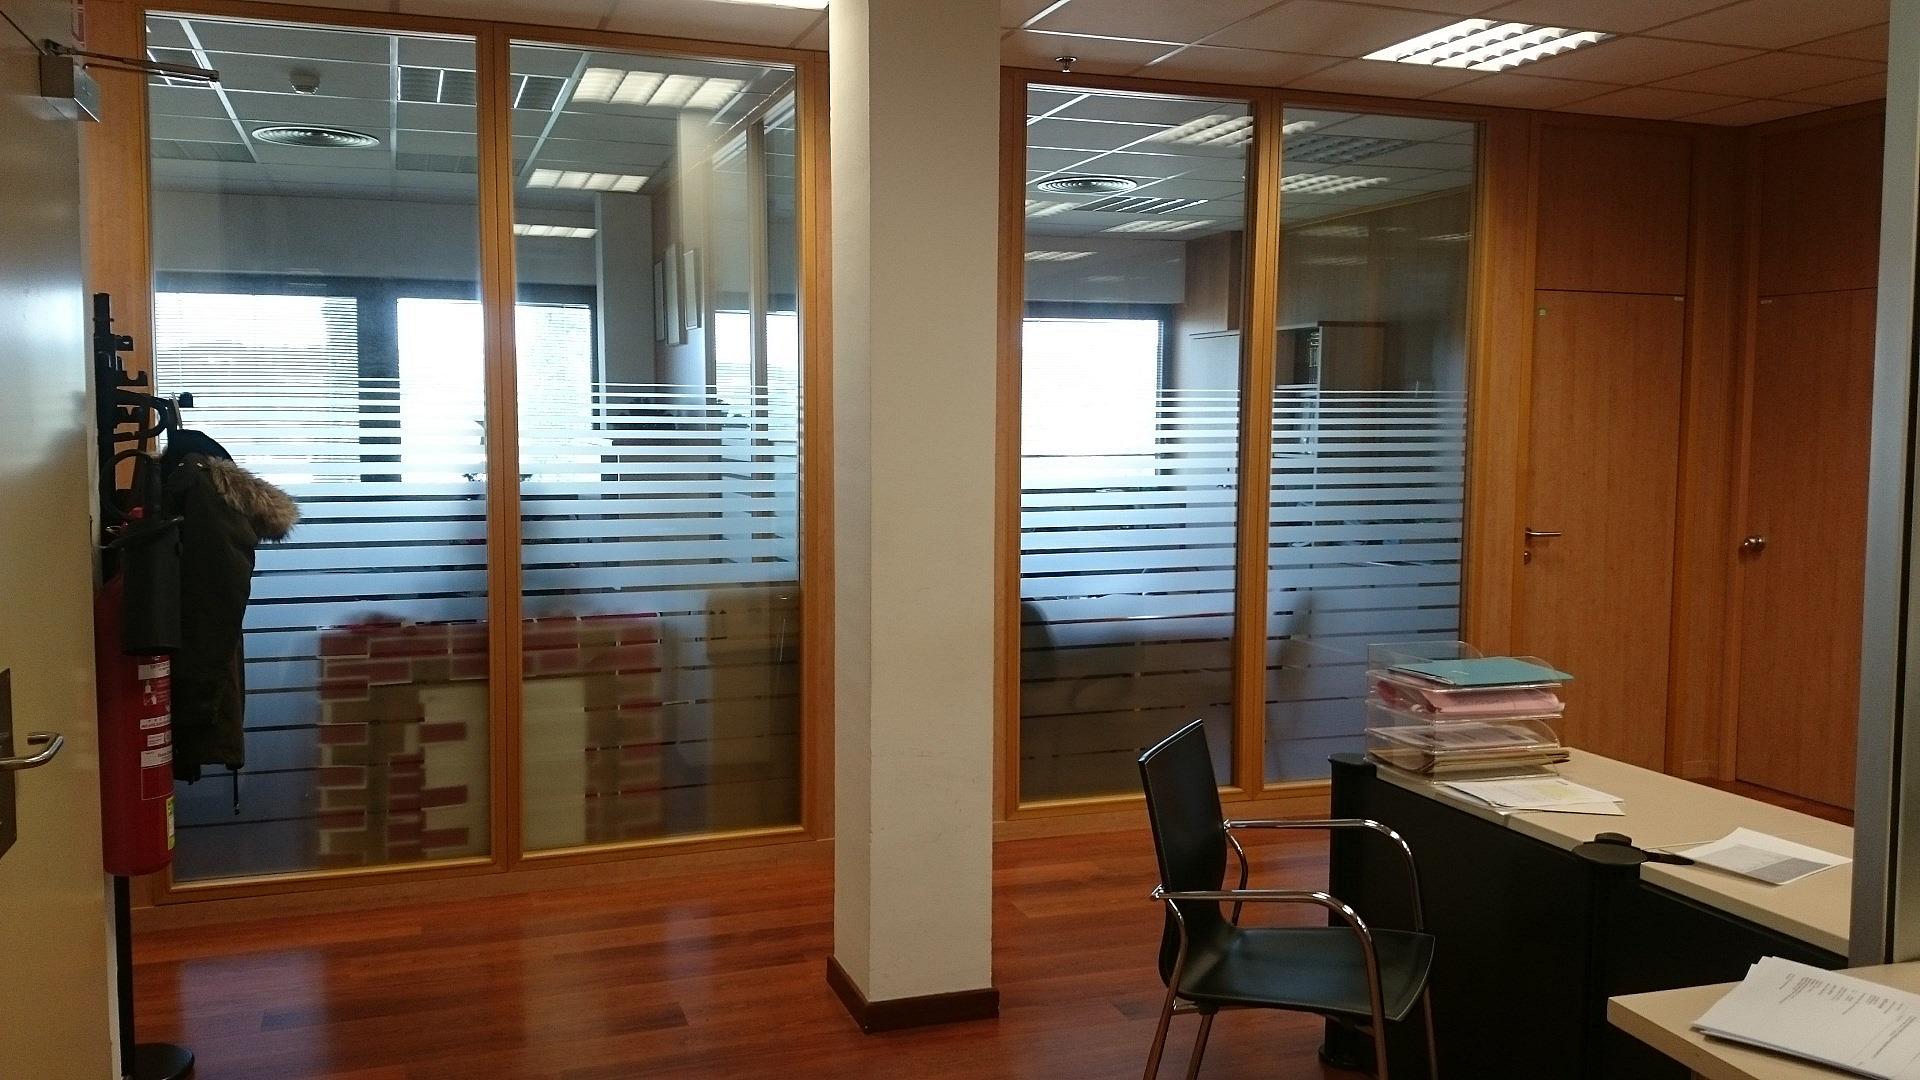 DSC_3197 - Oficina en alquiler en calle Ciclisme, Rubí - 267668055